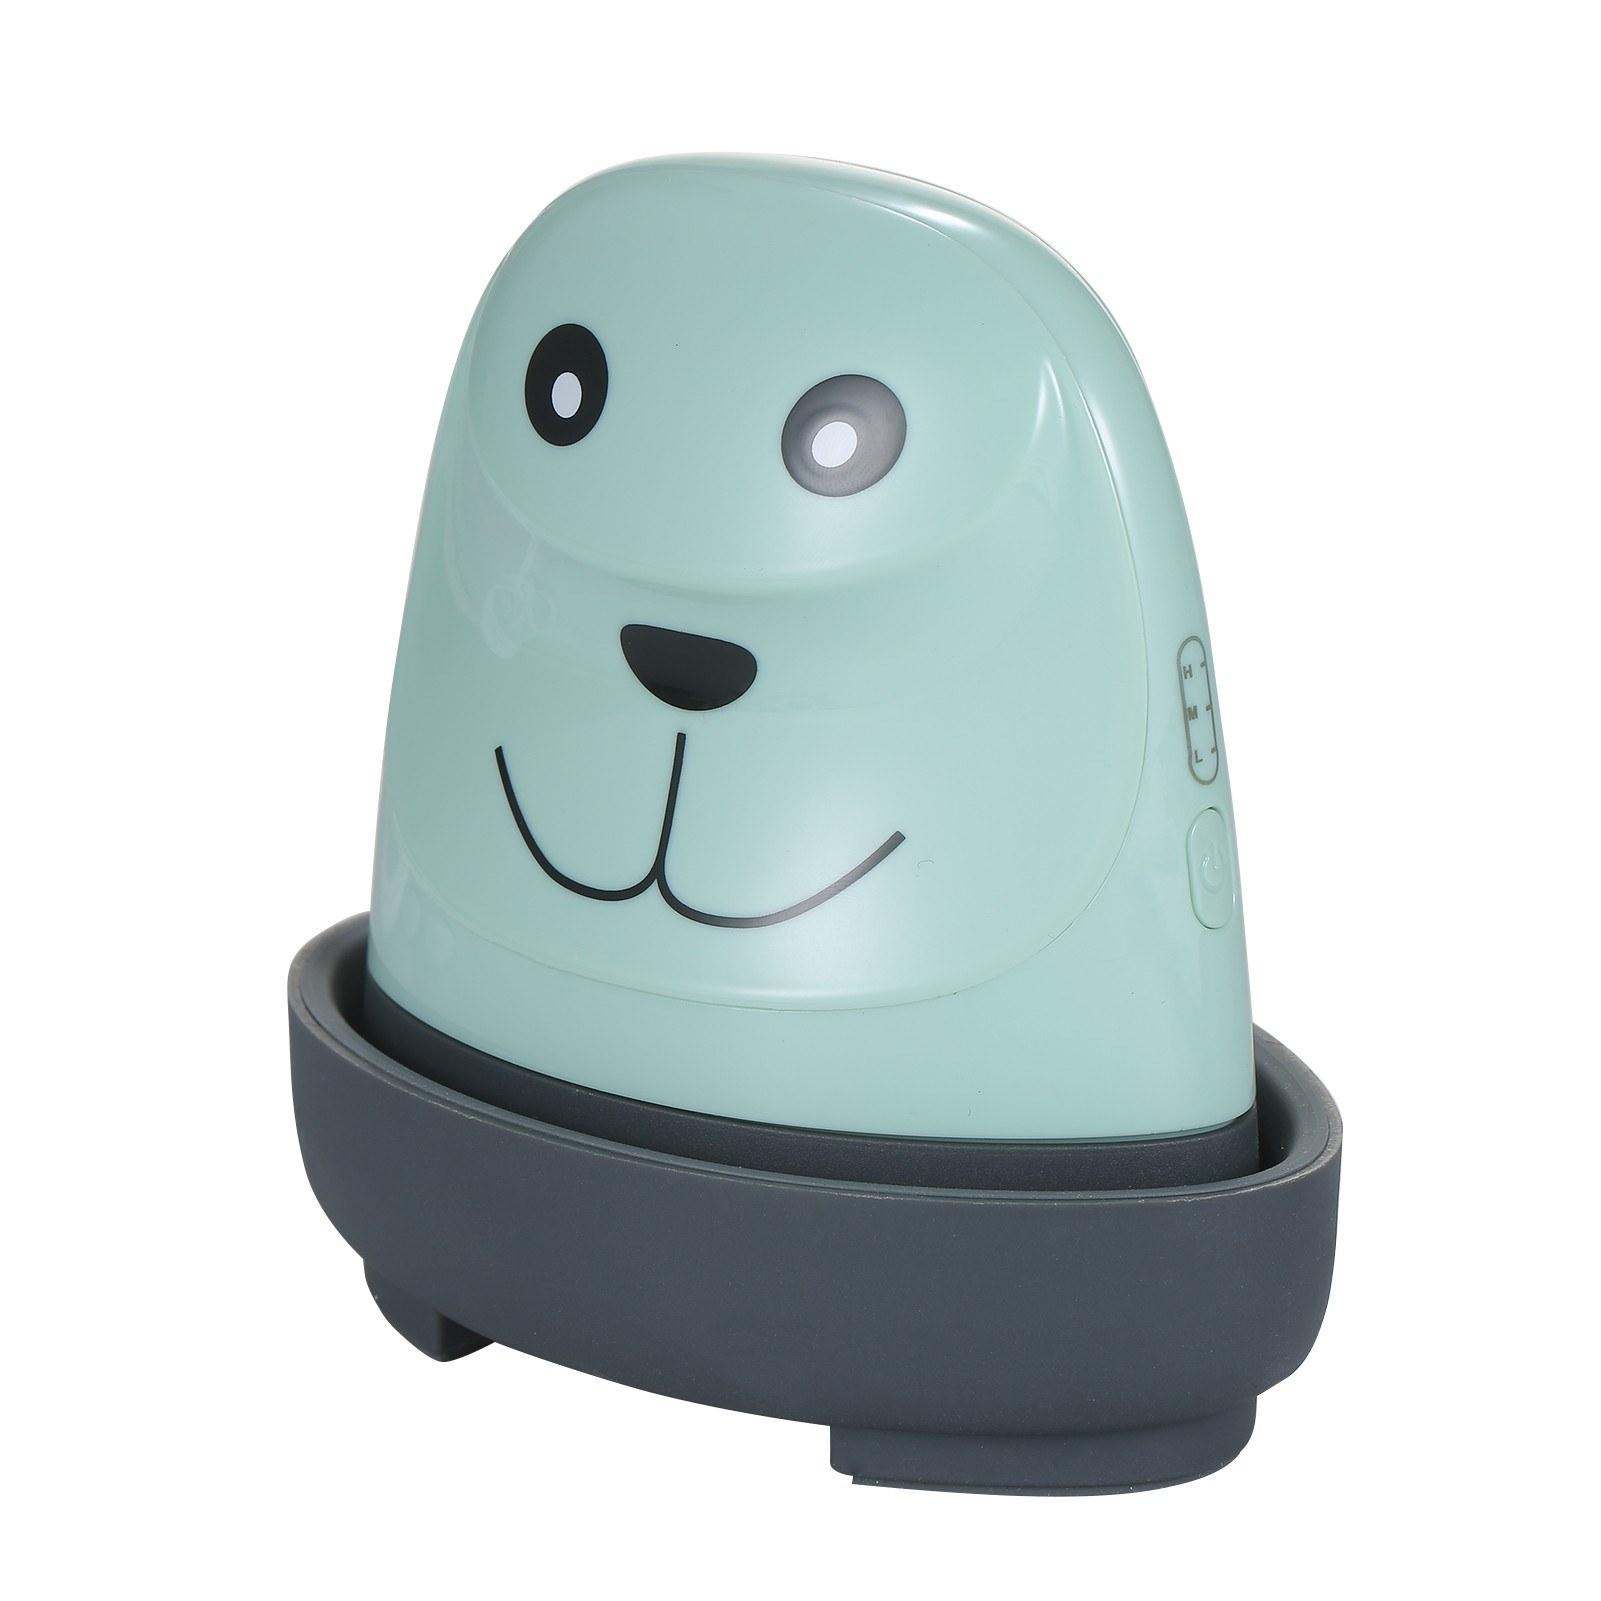 Tomtop - 30% OFF Mini Easy Heat Press Portable Cute Puppy Heat Press Machine, $46.99 (Inclusive of VAT)